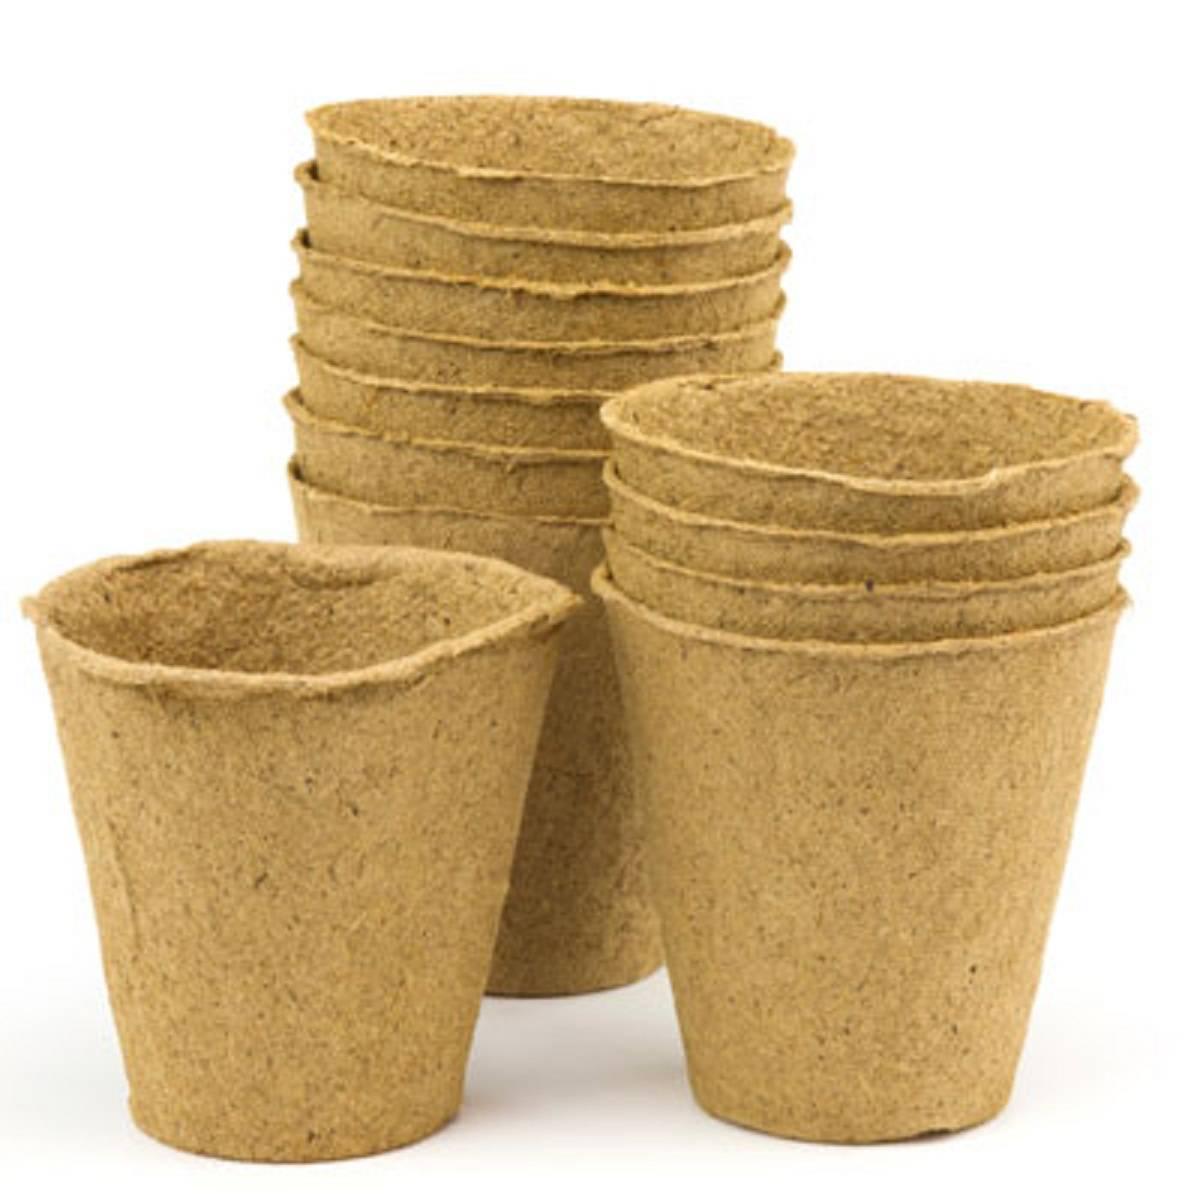 Biodegradable Gardening Pots